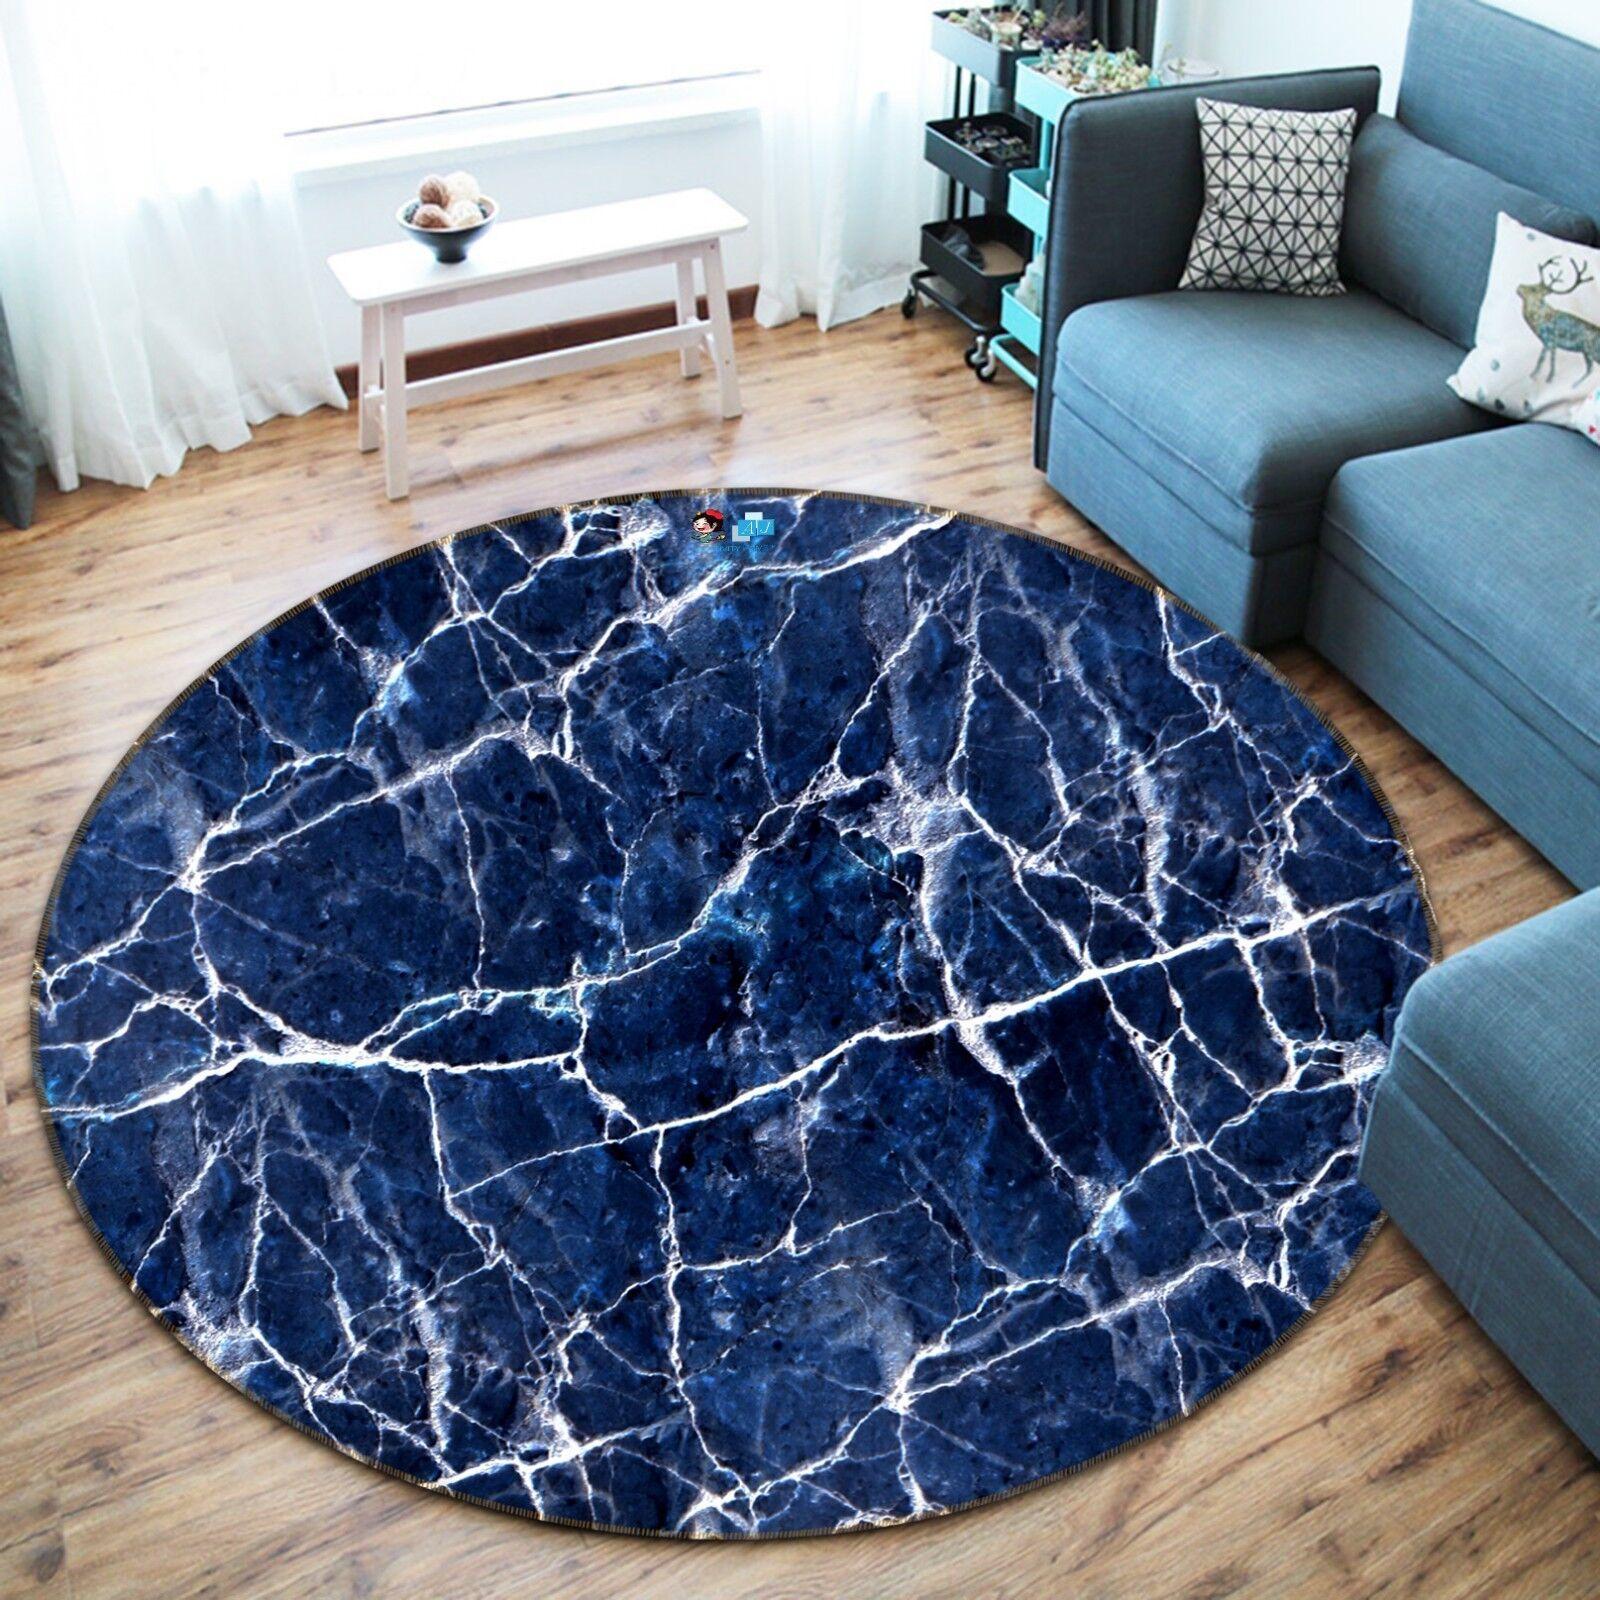 3d TEXTURE BIANCA 6 antiscivolo tappeto bagagliaio giri elegante TAPPETO de